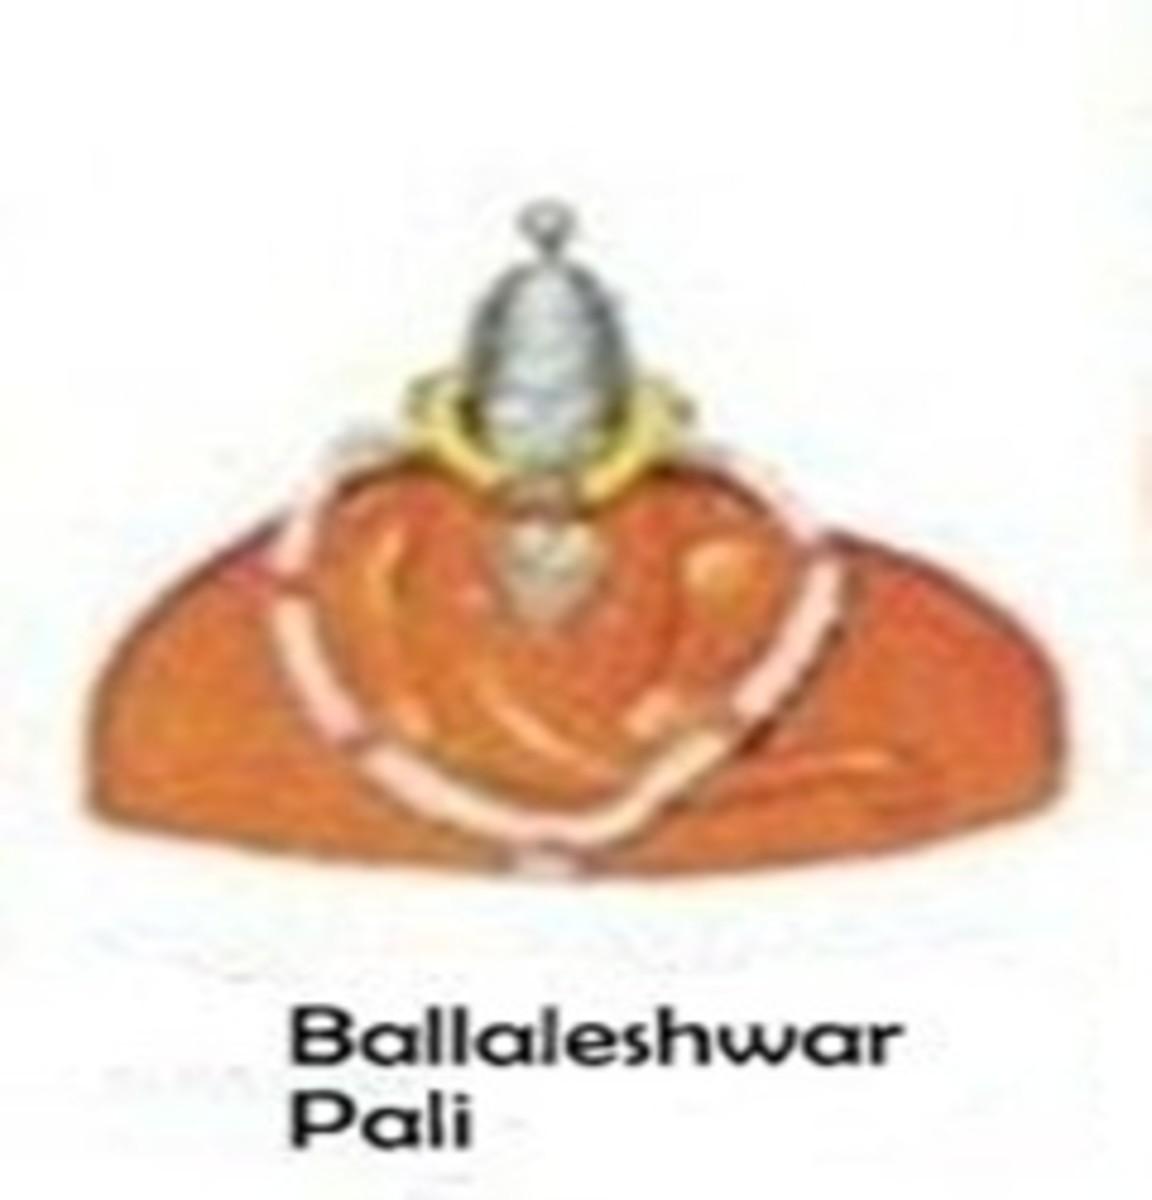 Shri Ballaleshwar Templo, Pali